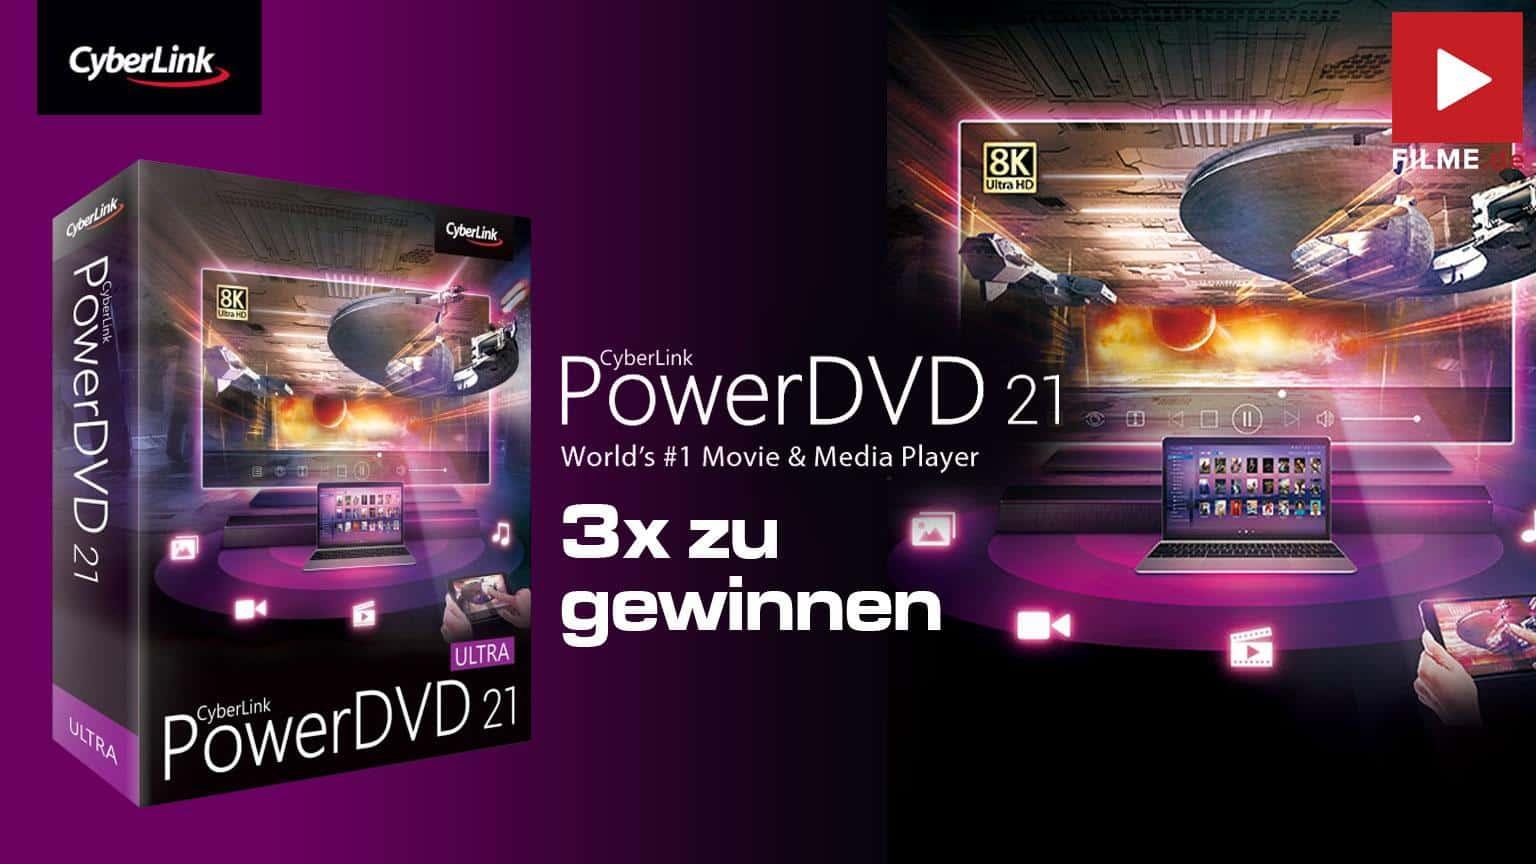 PowerDVD 21 Ultra Box Software Gewinnspiel gewinnen Shop kaufen Artikelbild